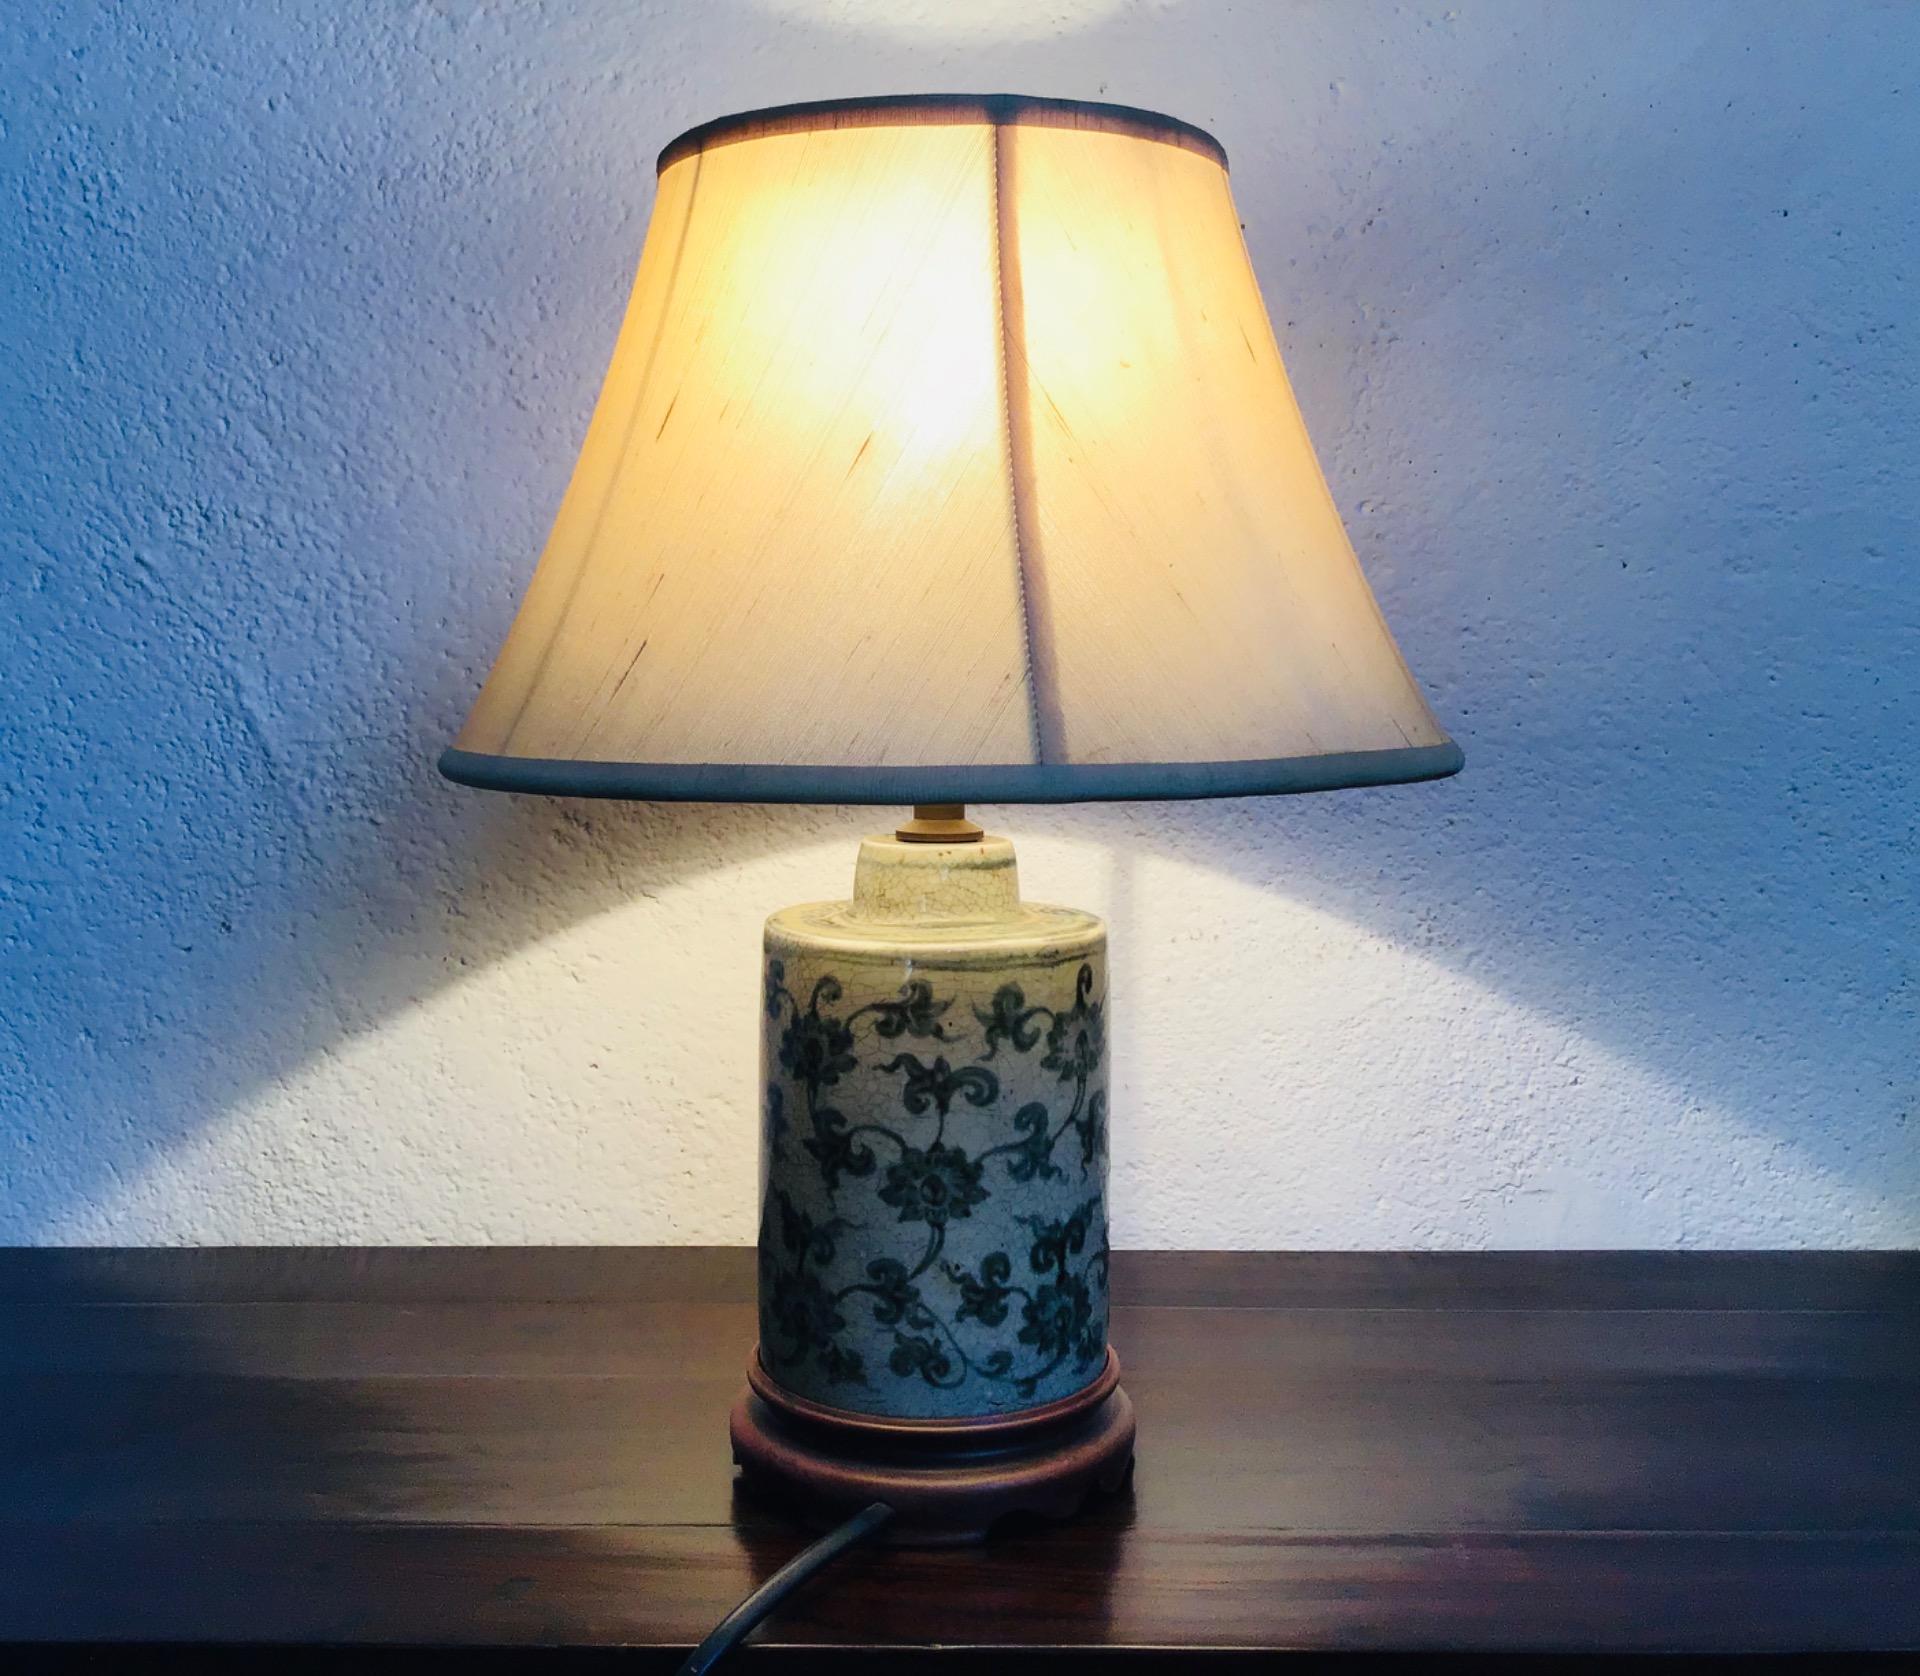 thumb8|Coppia lampade